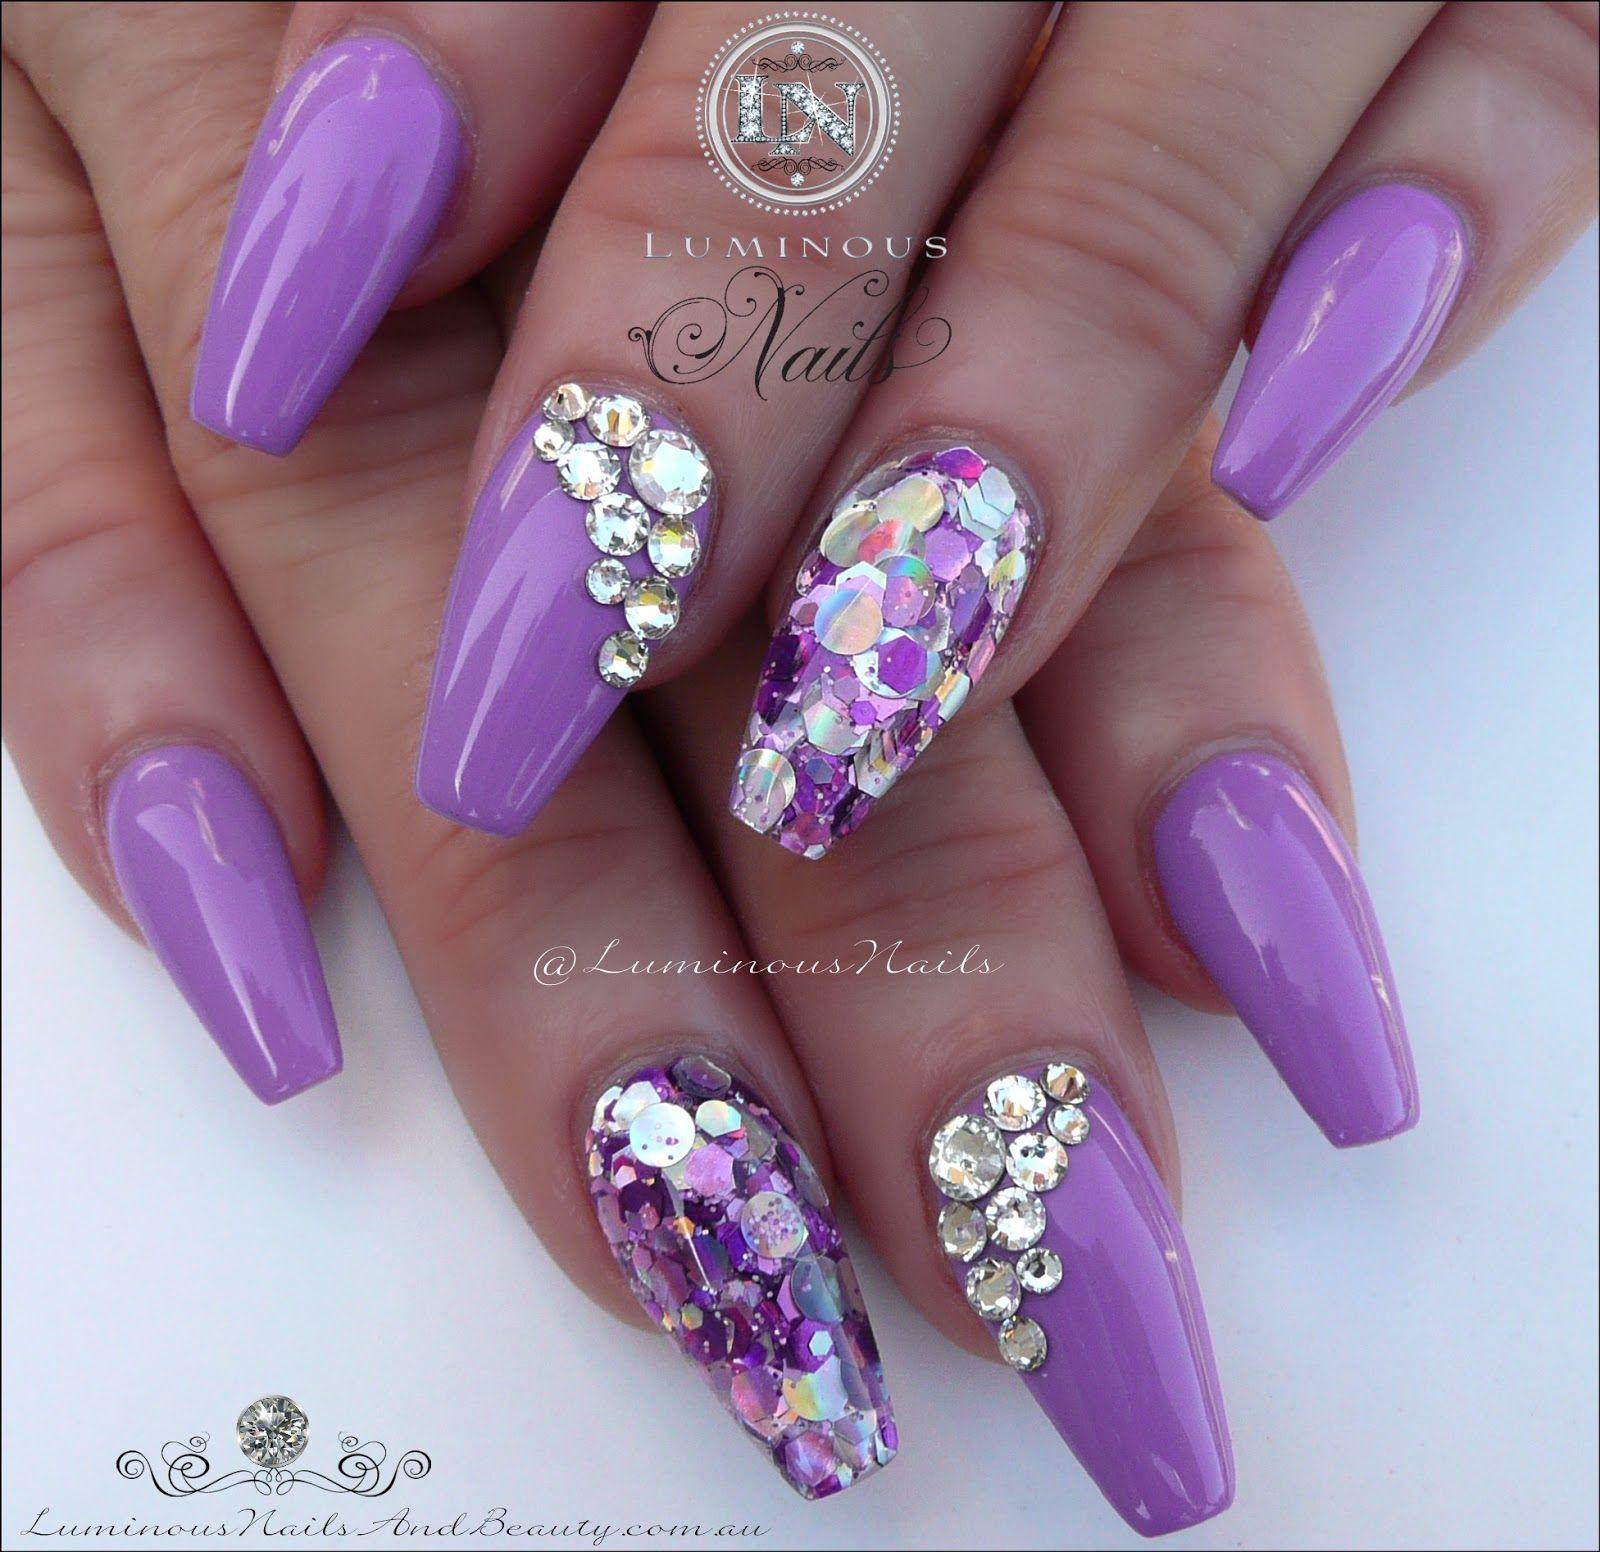 luminous nails: stunning mauve acrylic nails with bling